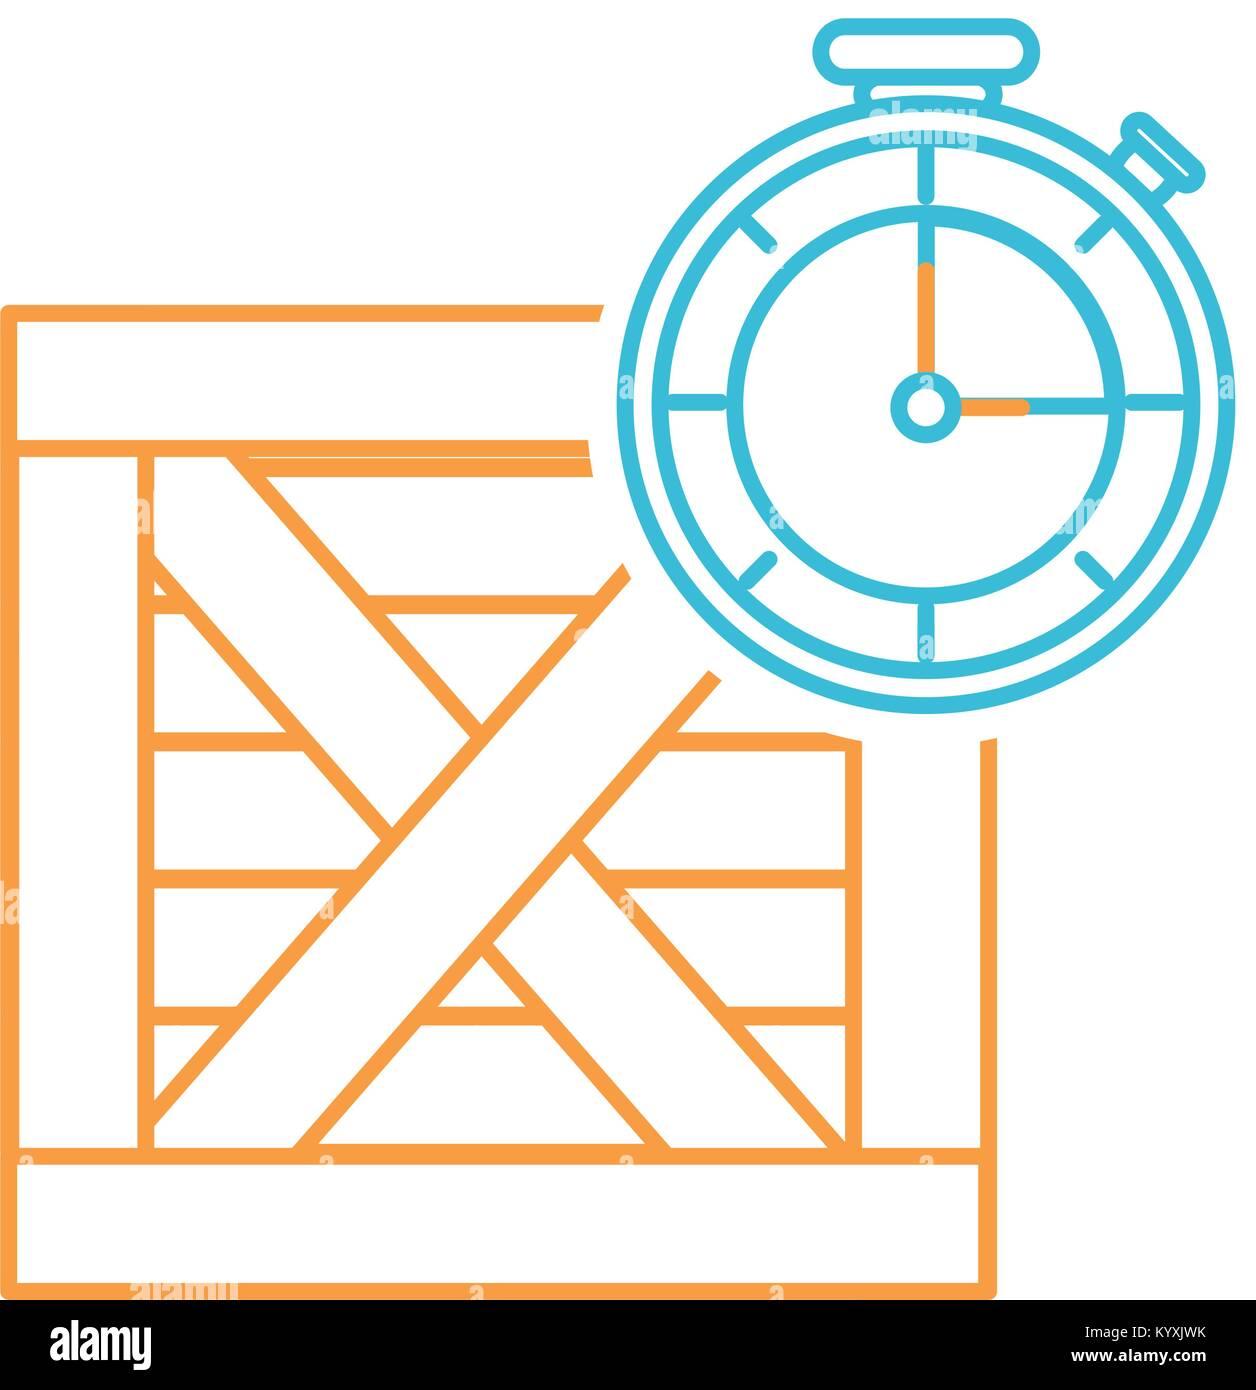 Box and chronometer design - Stock Image